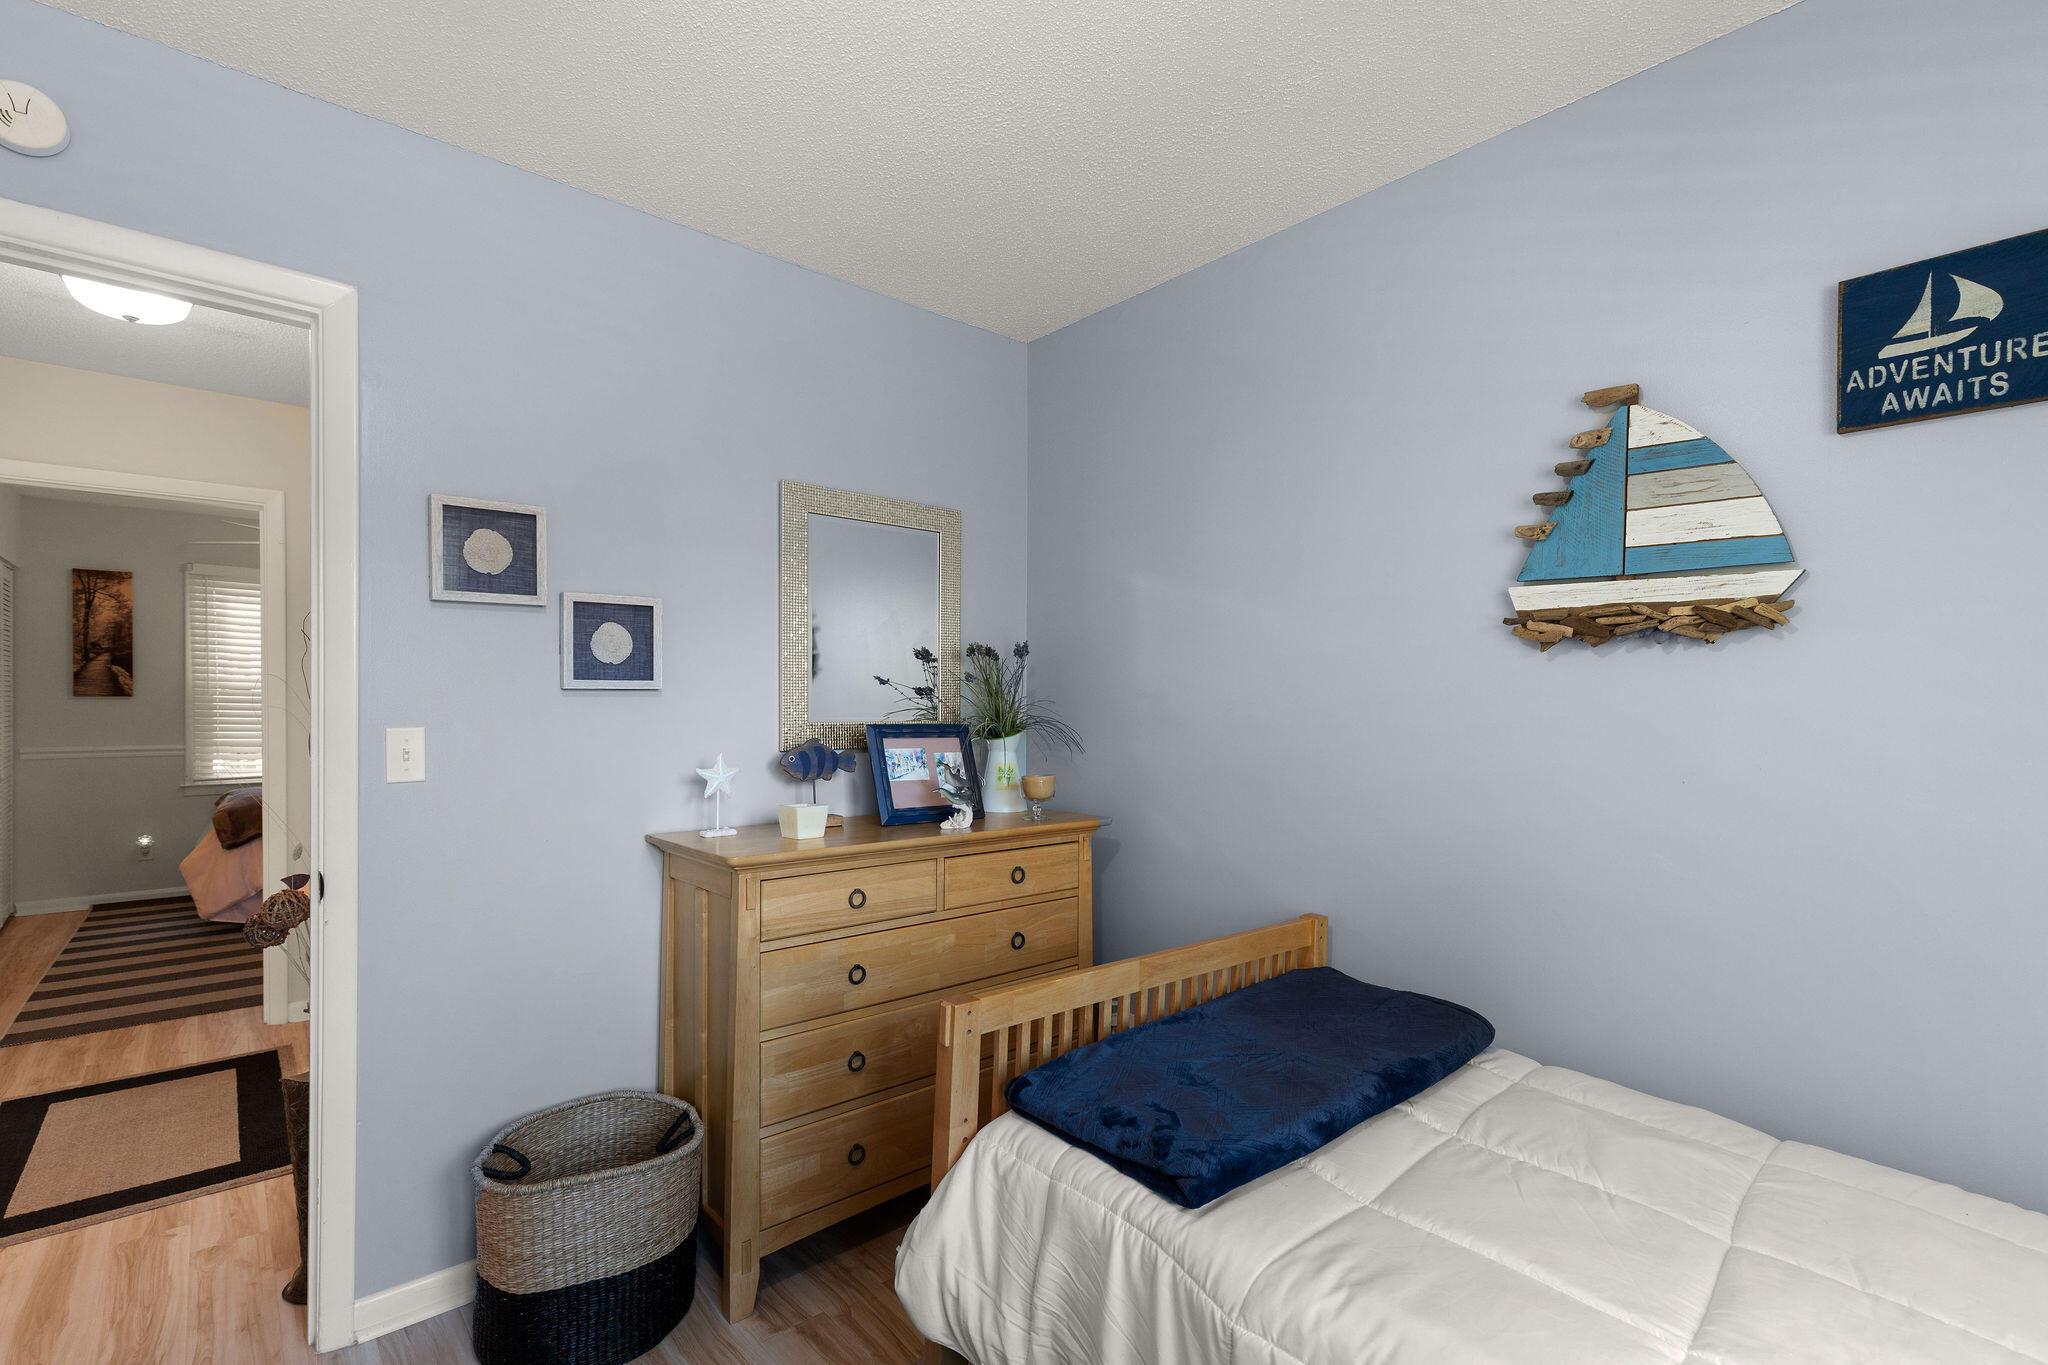 Seabrook Island Homes For Sale - 515 Cobby Creek, Seabrook Island, SC - 29